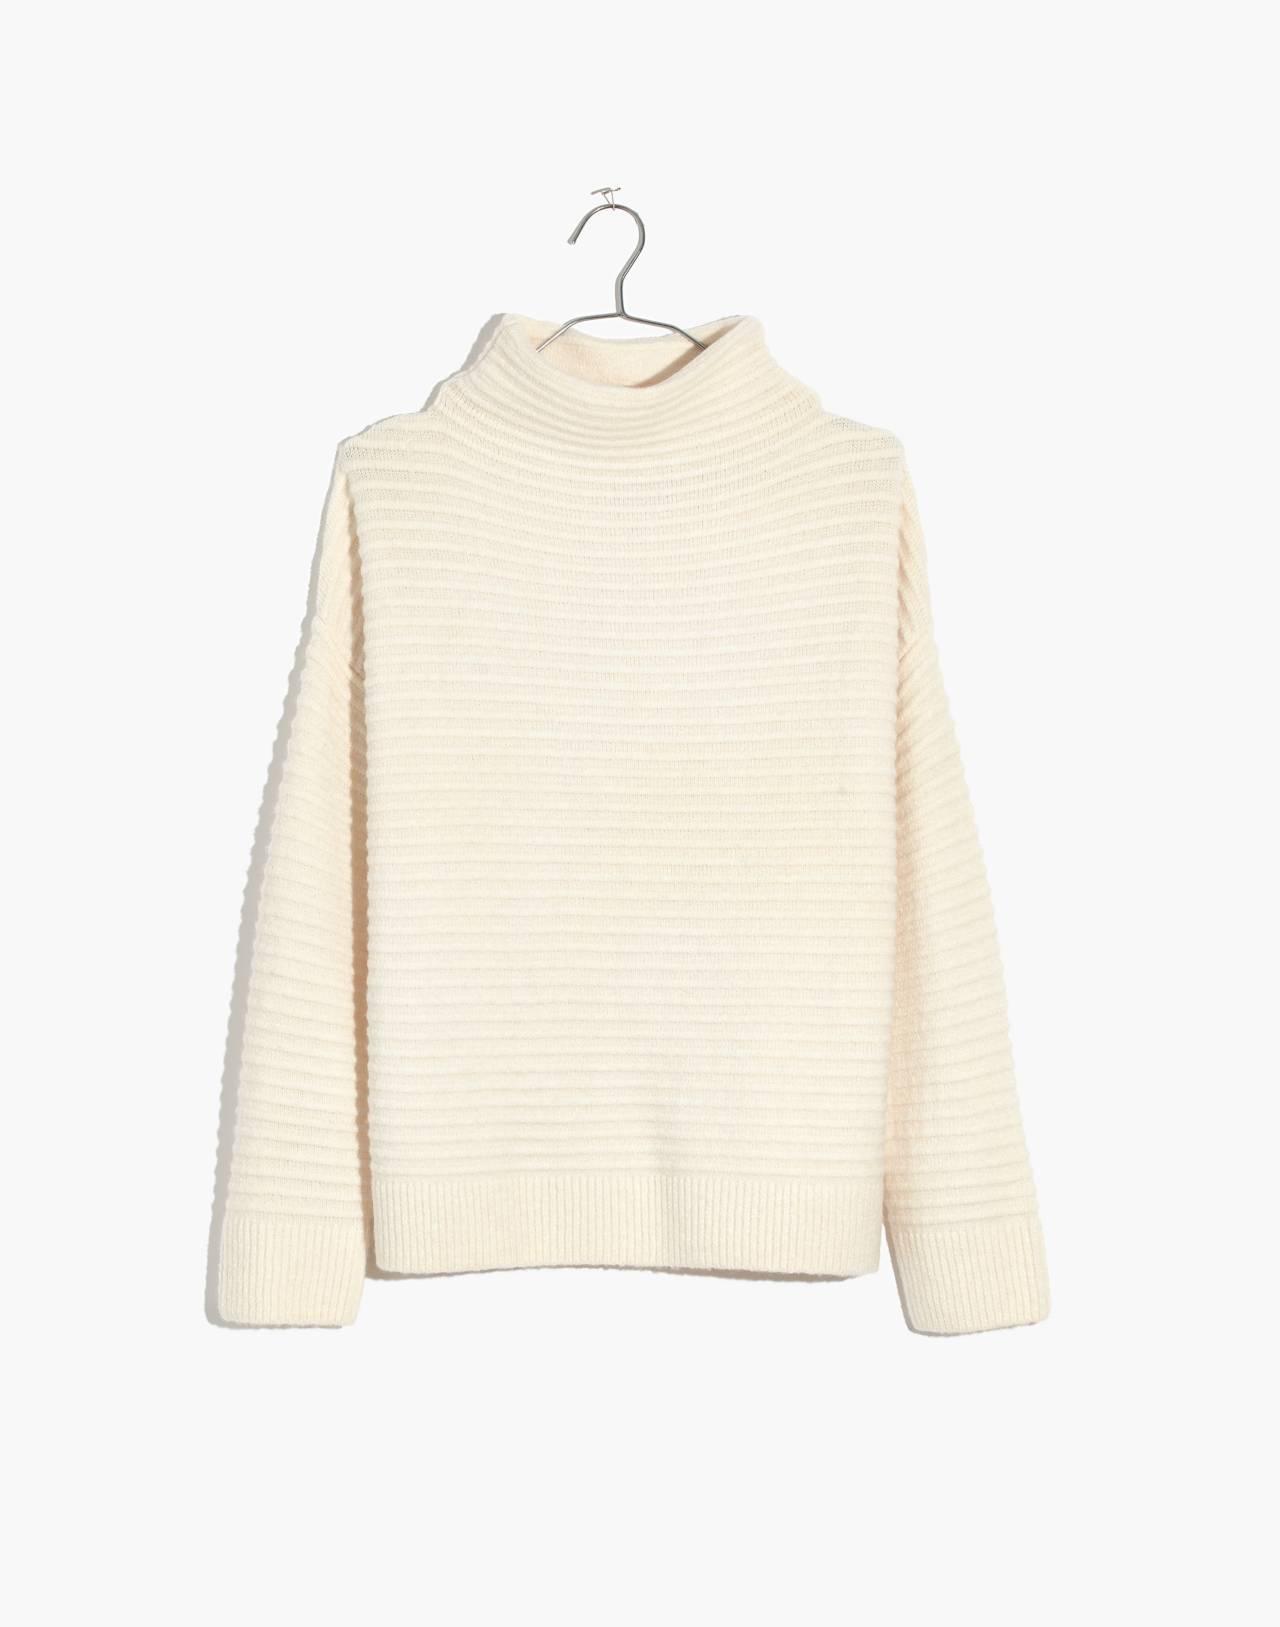 Belmont Mockneck Sweater in Coziest Yarn in antique cream image 4